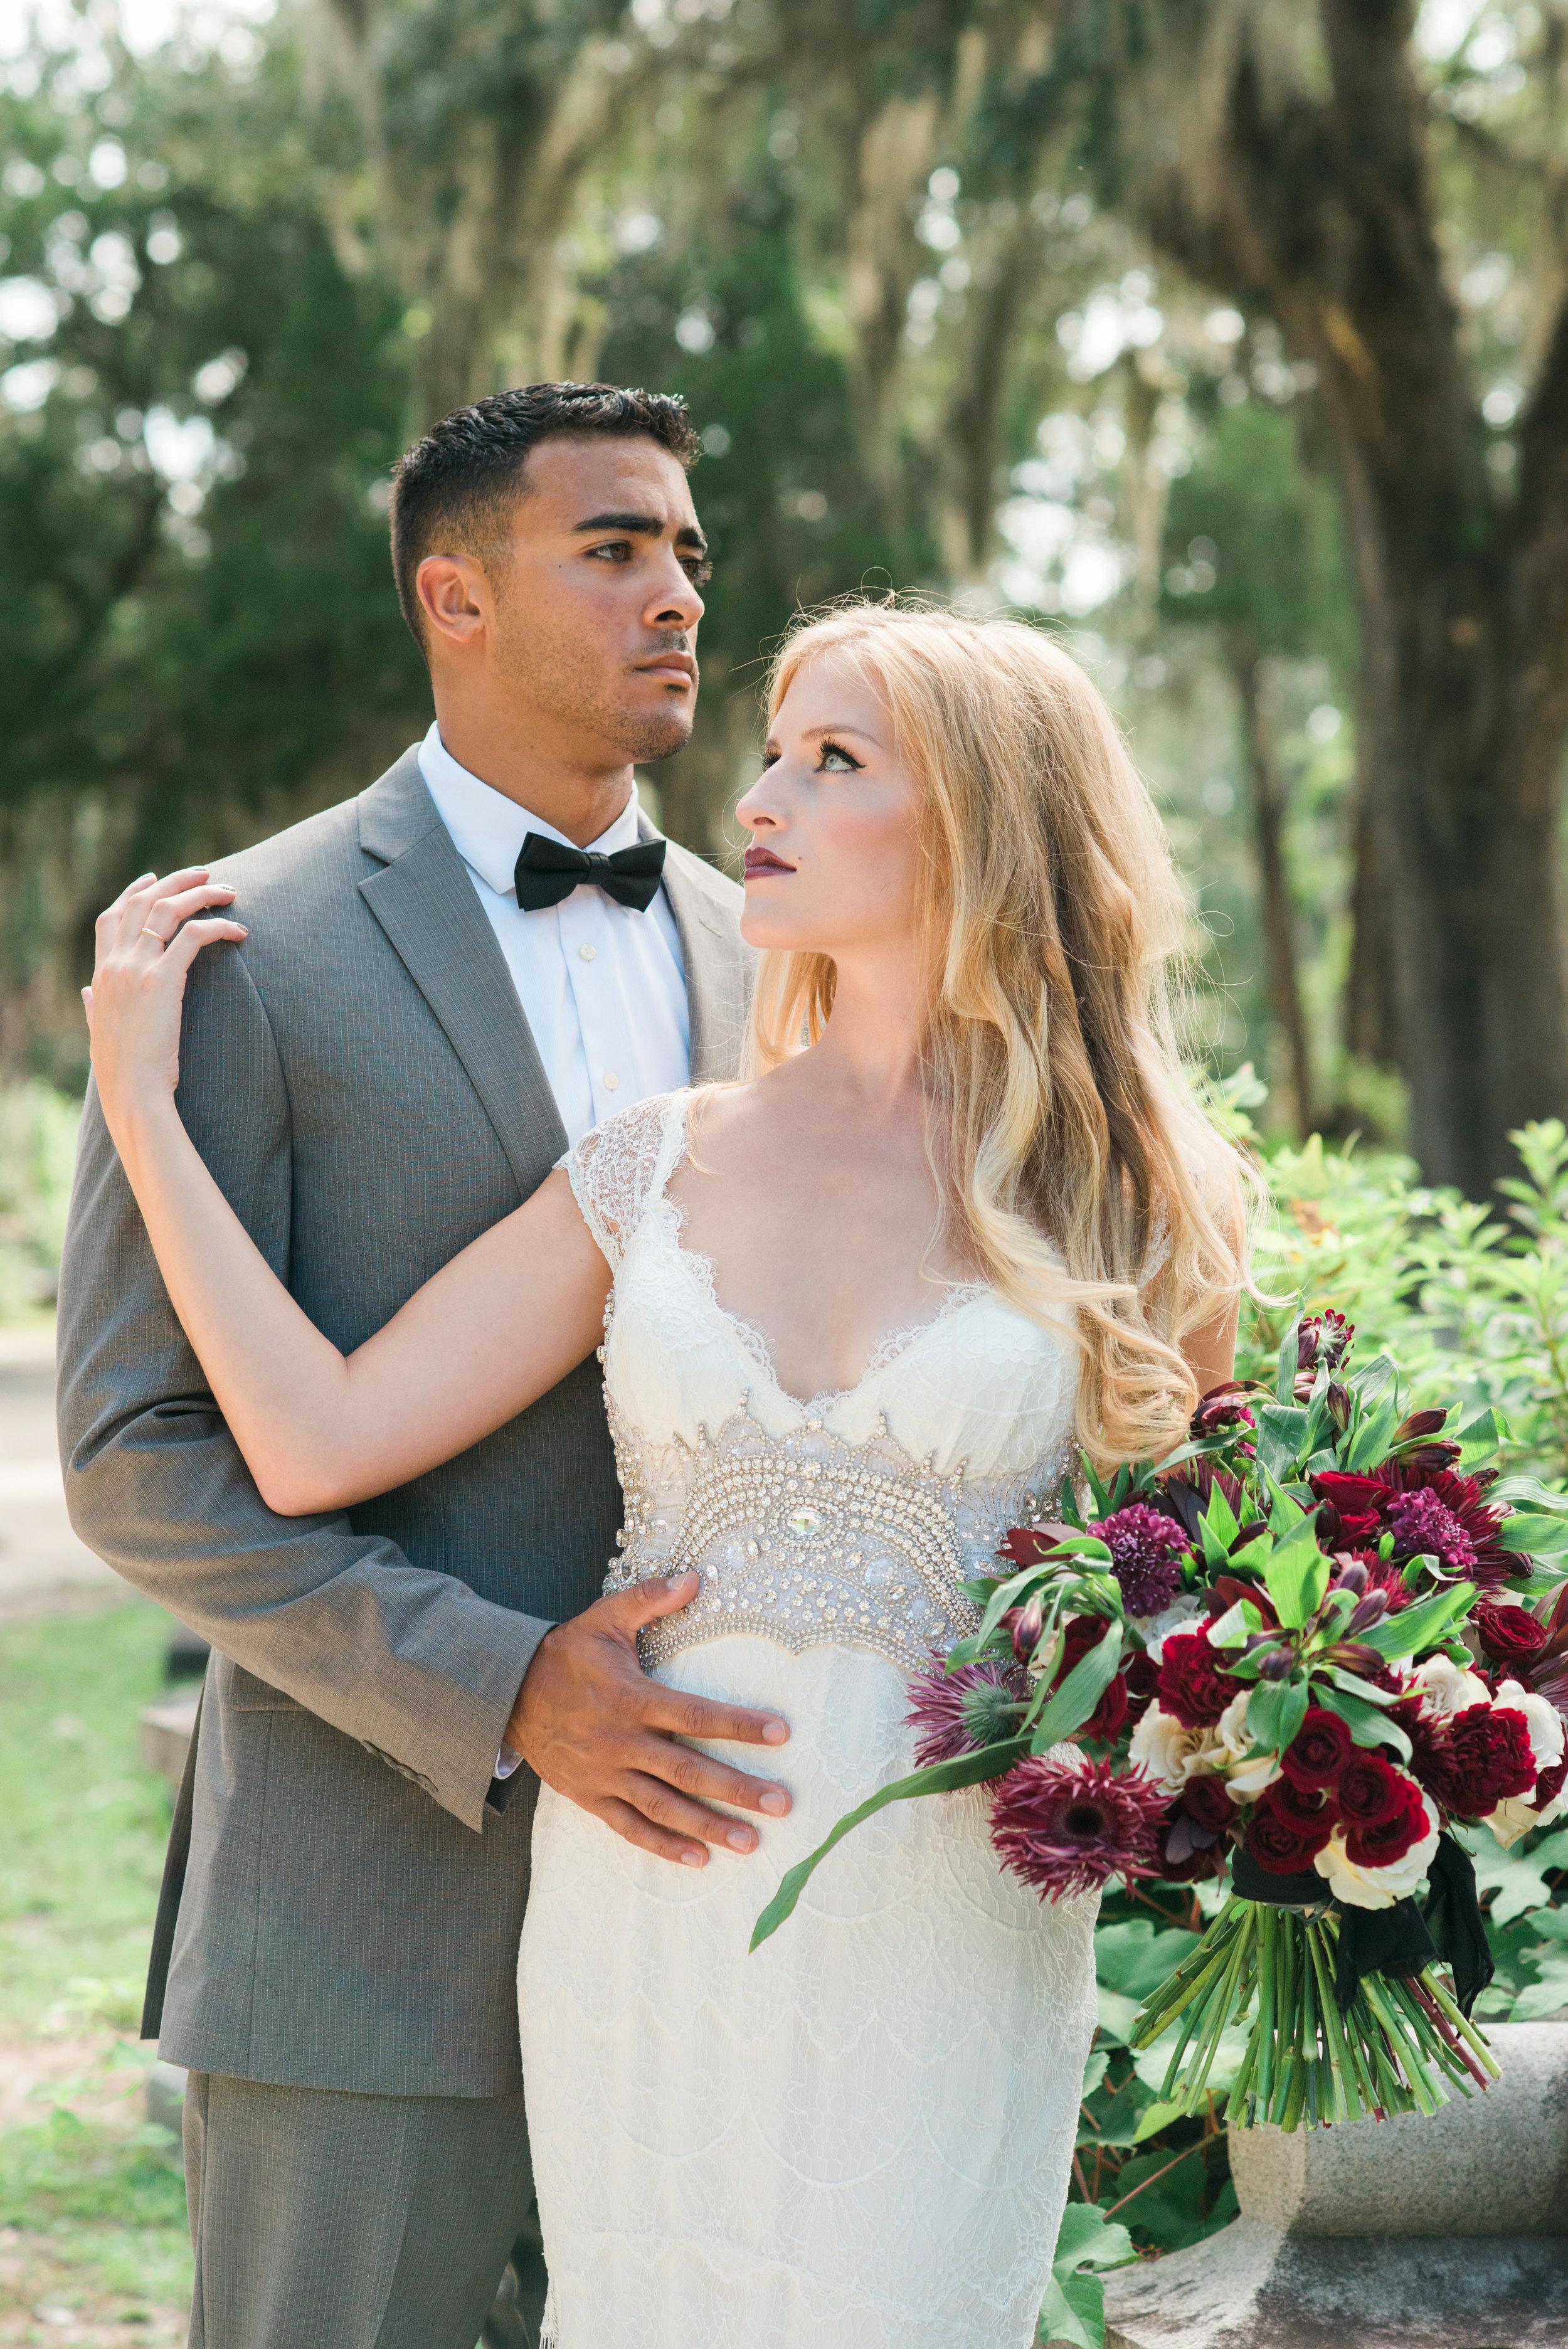 callie-beale-photography-Bonaventure-cemetery-michelle-royal-makeup-cemetery-wedding-ivory-and-beau-wedding-planning-anna-campbell-harper-savannah-bridal-boutique-savannah-wedding-dresses-savannah-weddings-11.jpg